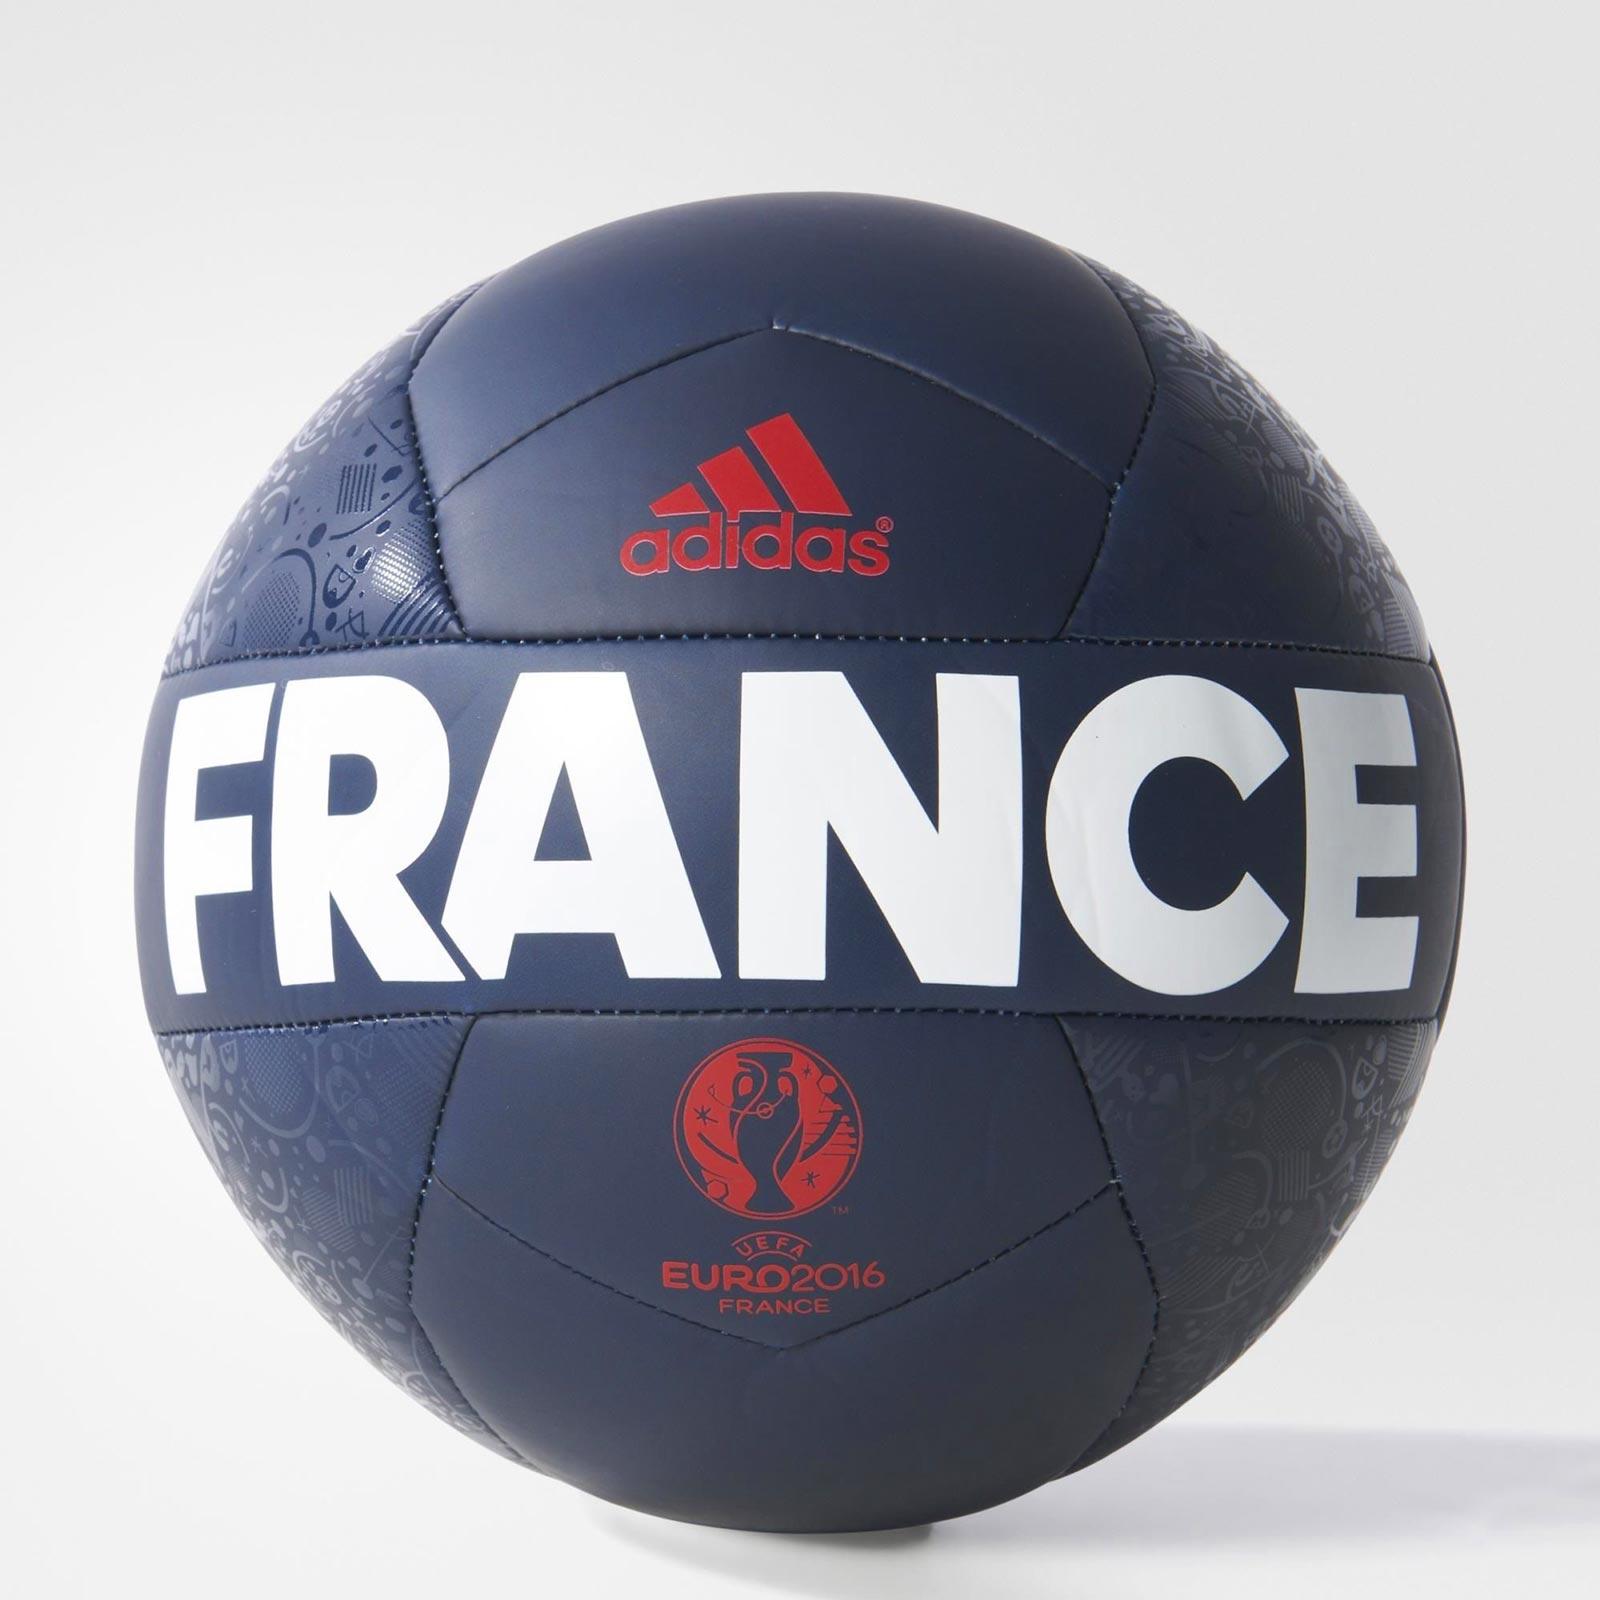 France Supporter s Ball 16